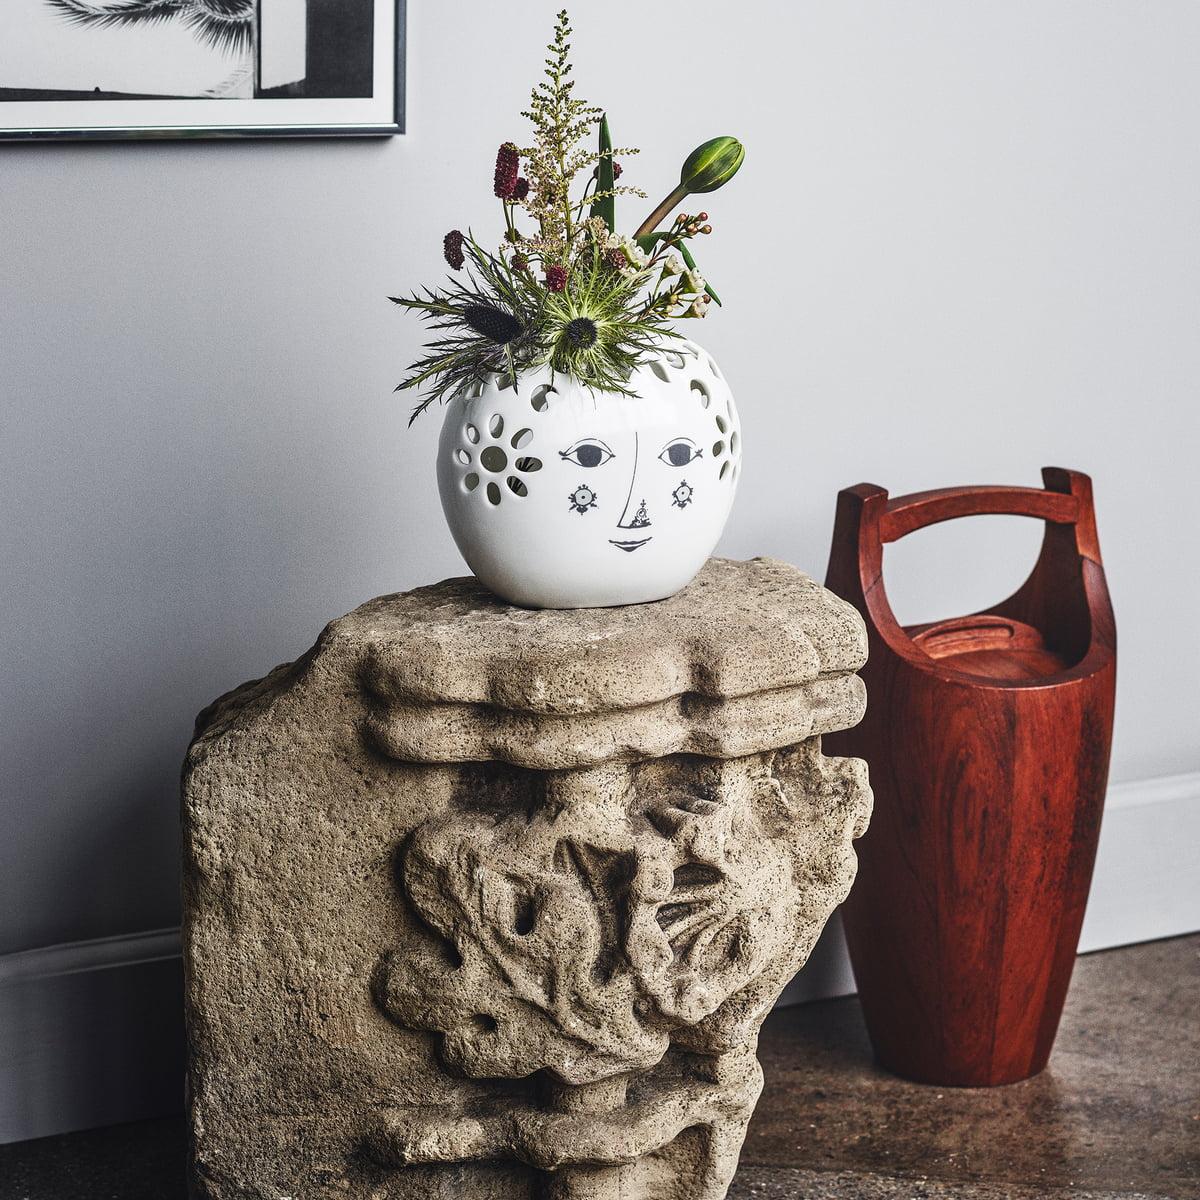 Flower vase by bjrn wiinblad connox shop flower vase by bjrn wiinblad reviewsmspy